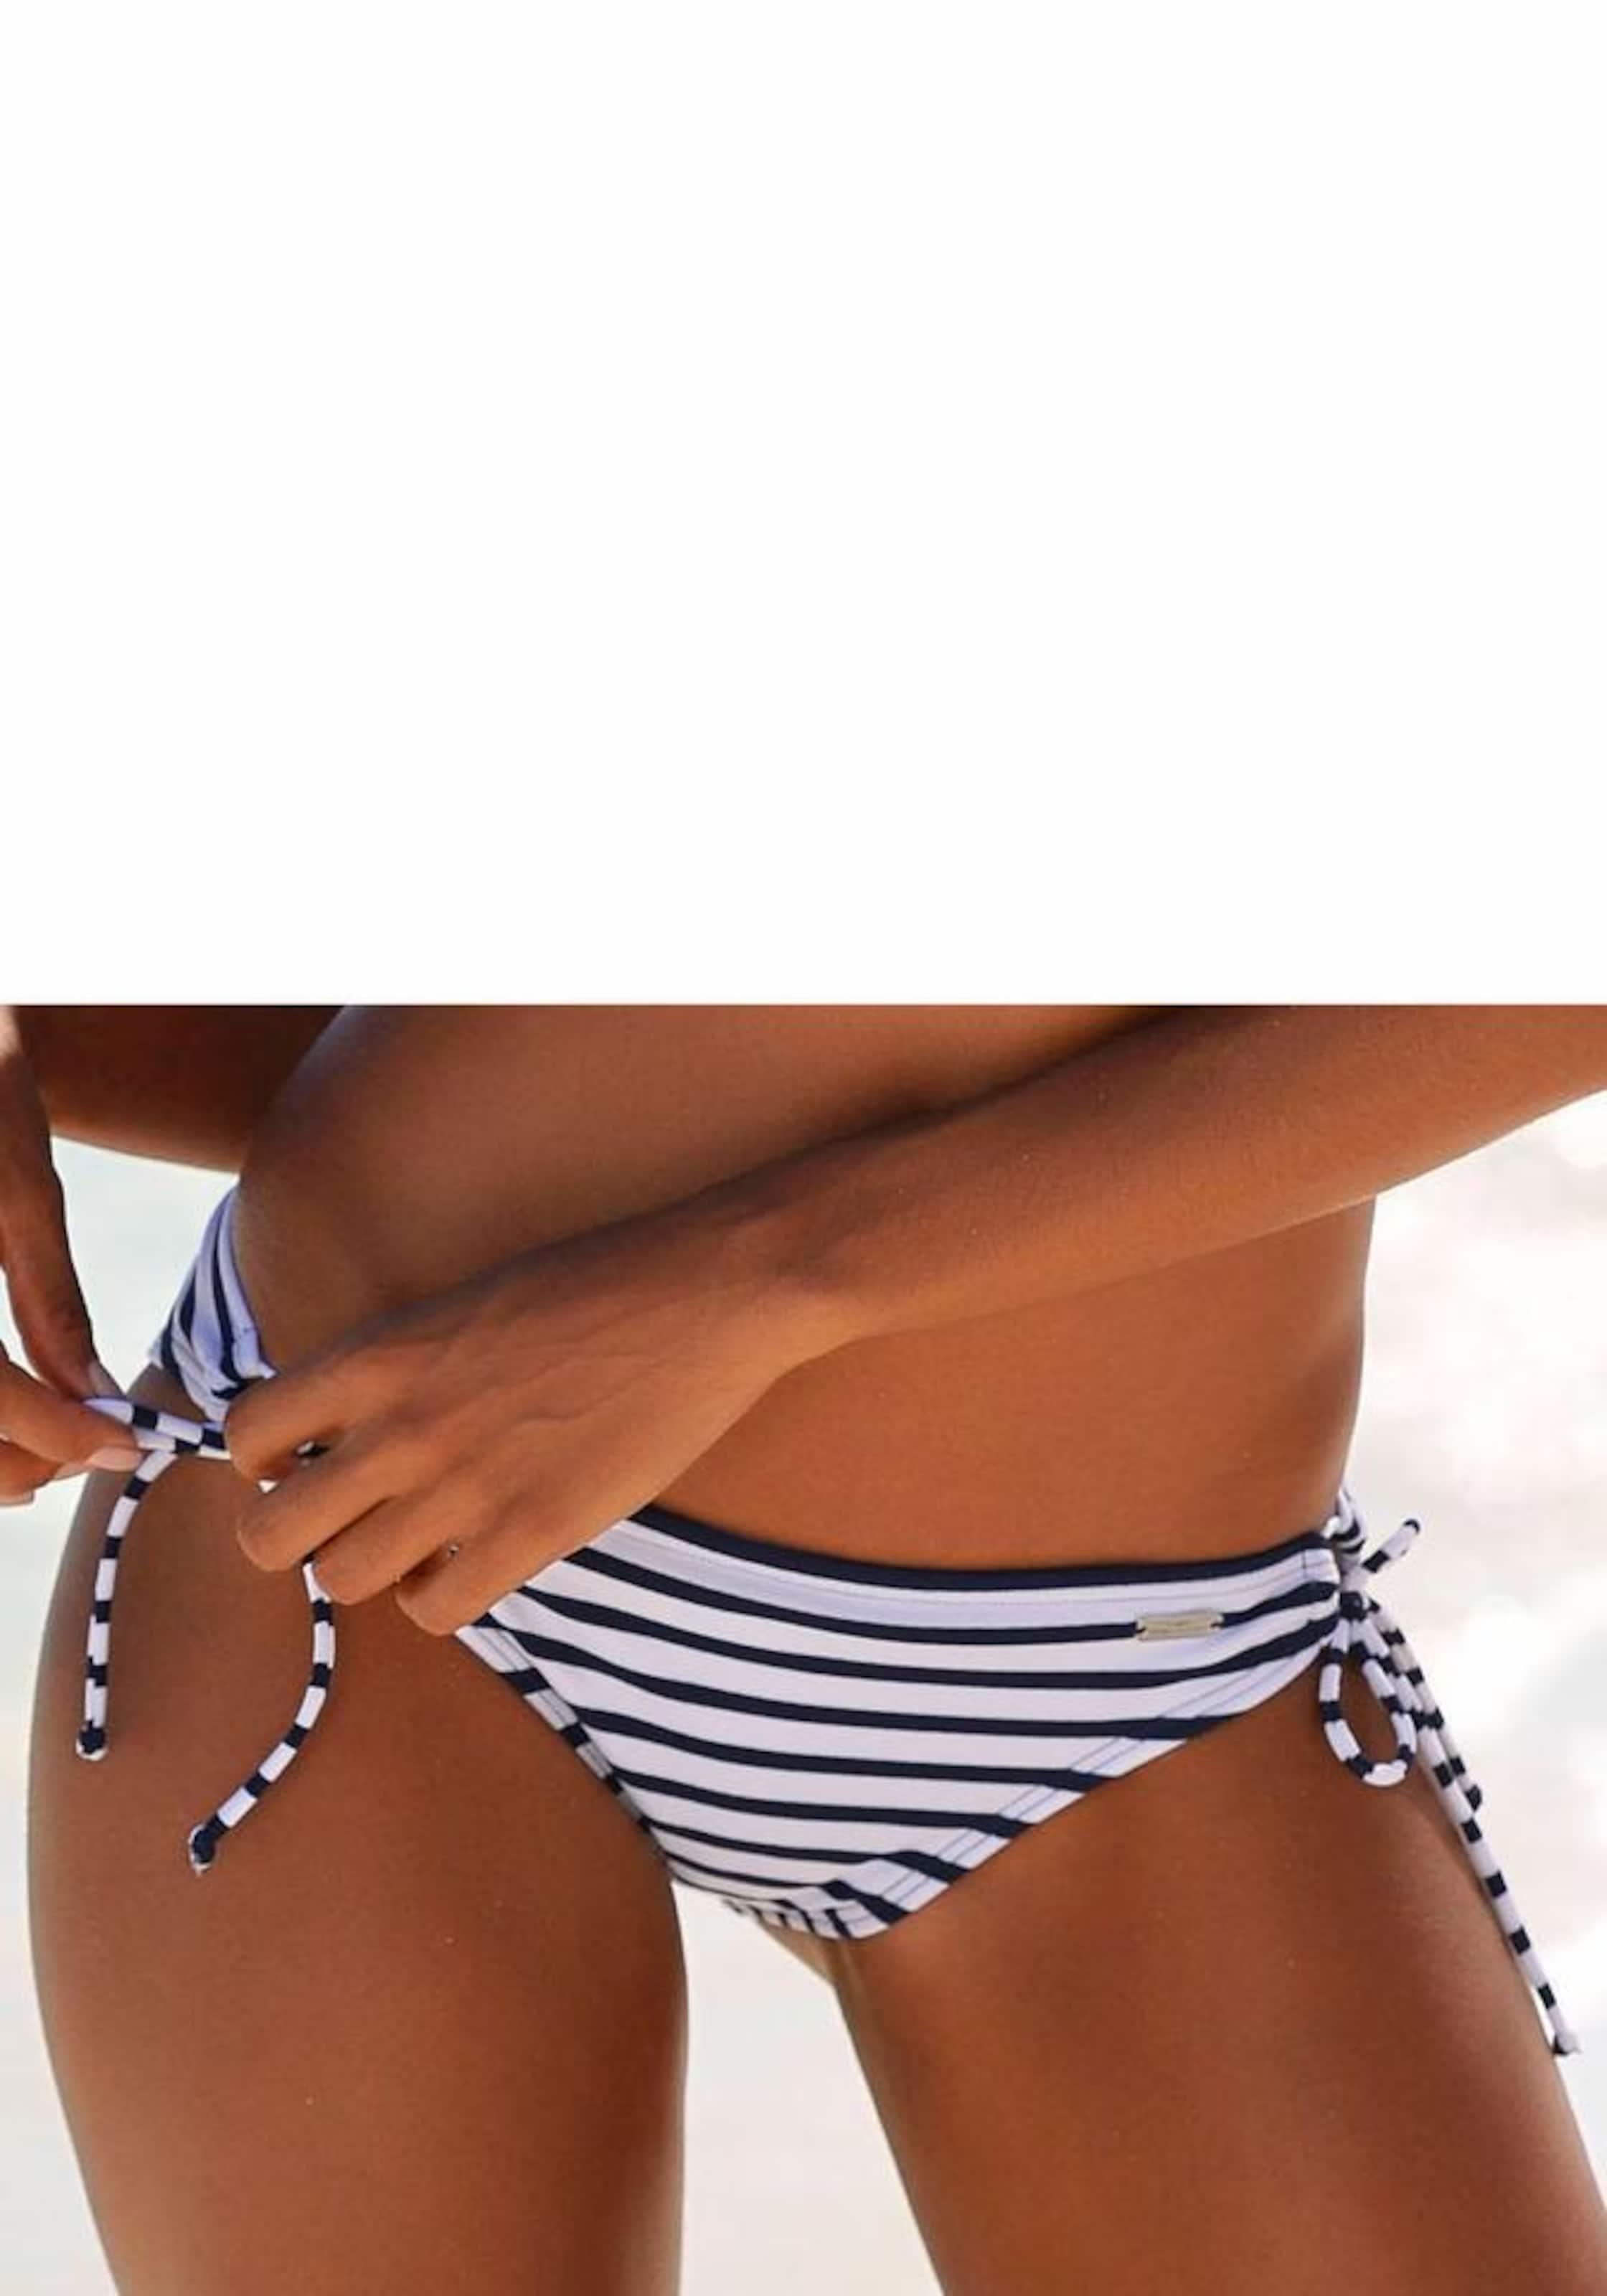 Venice Beach hose Bikini NavyWeiß 'summer' In 5R34AjL